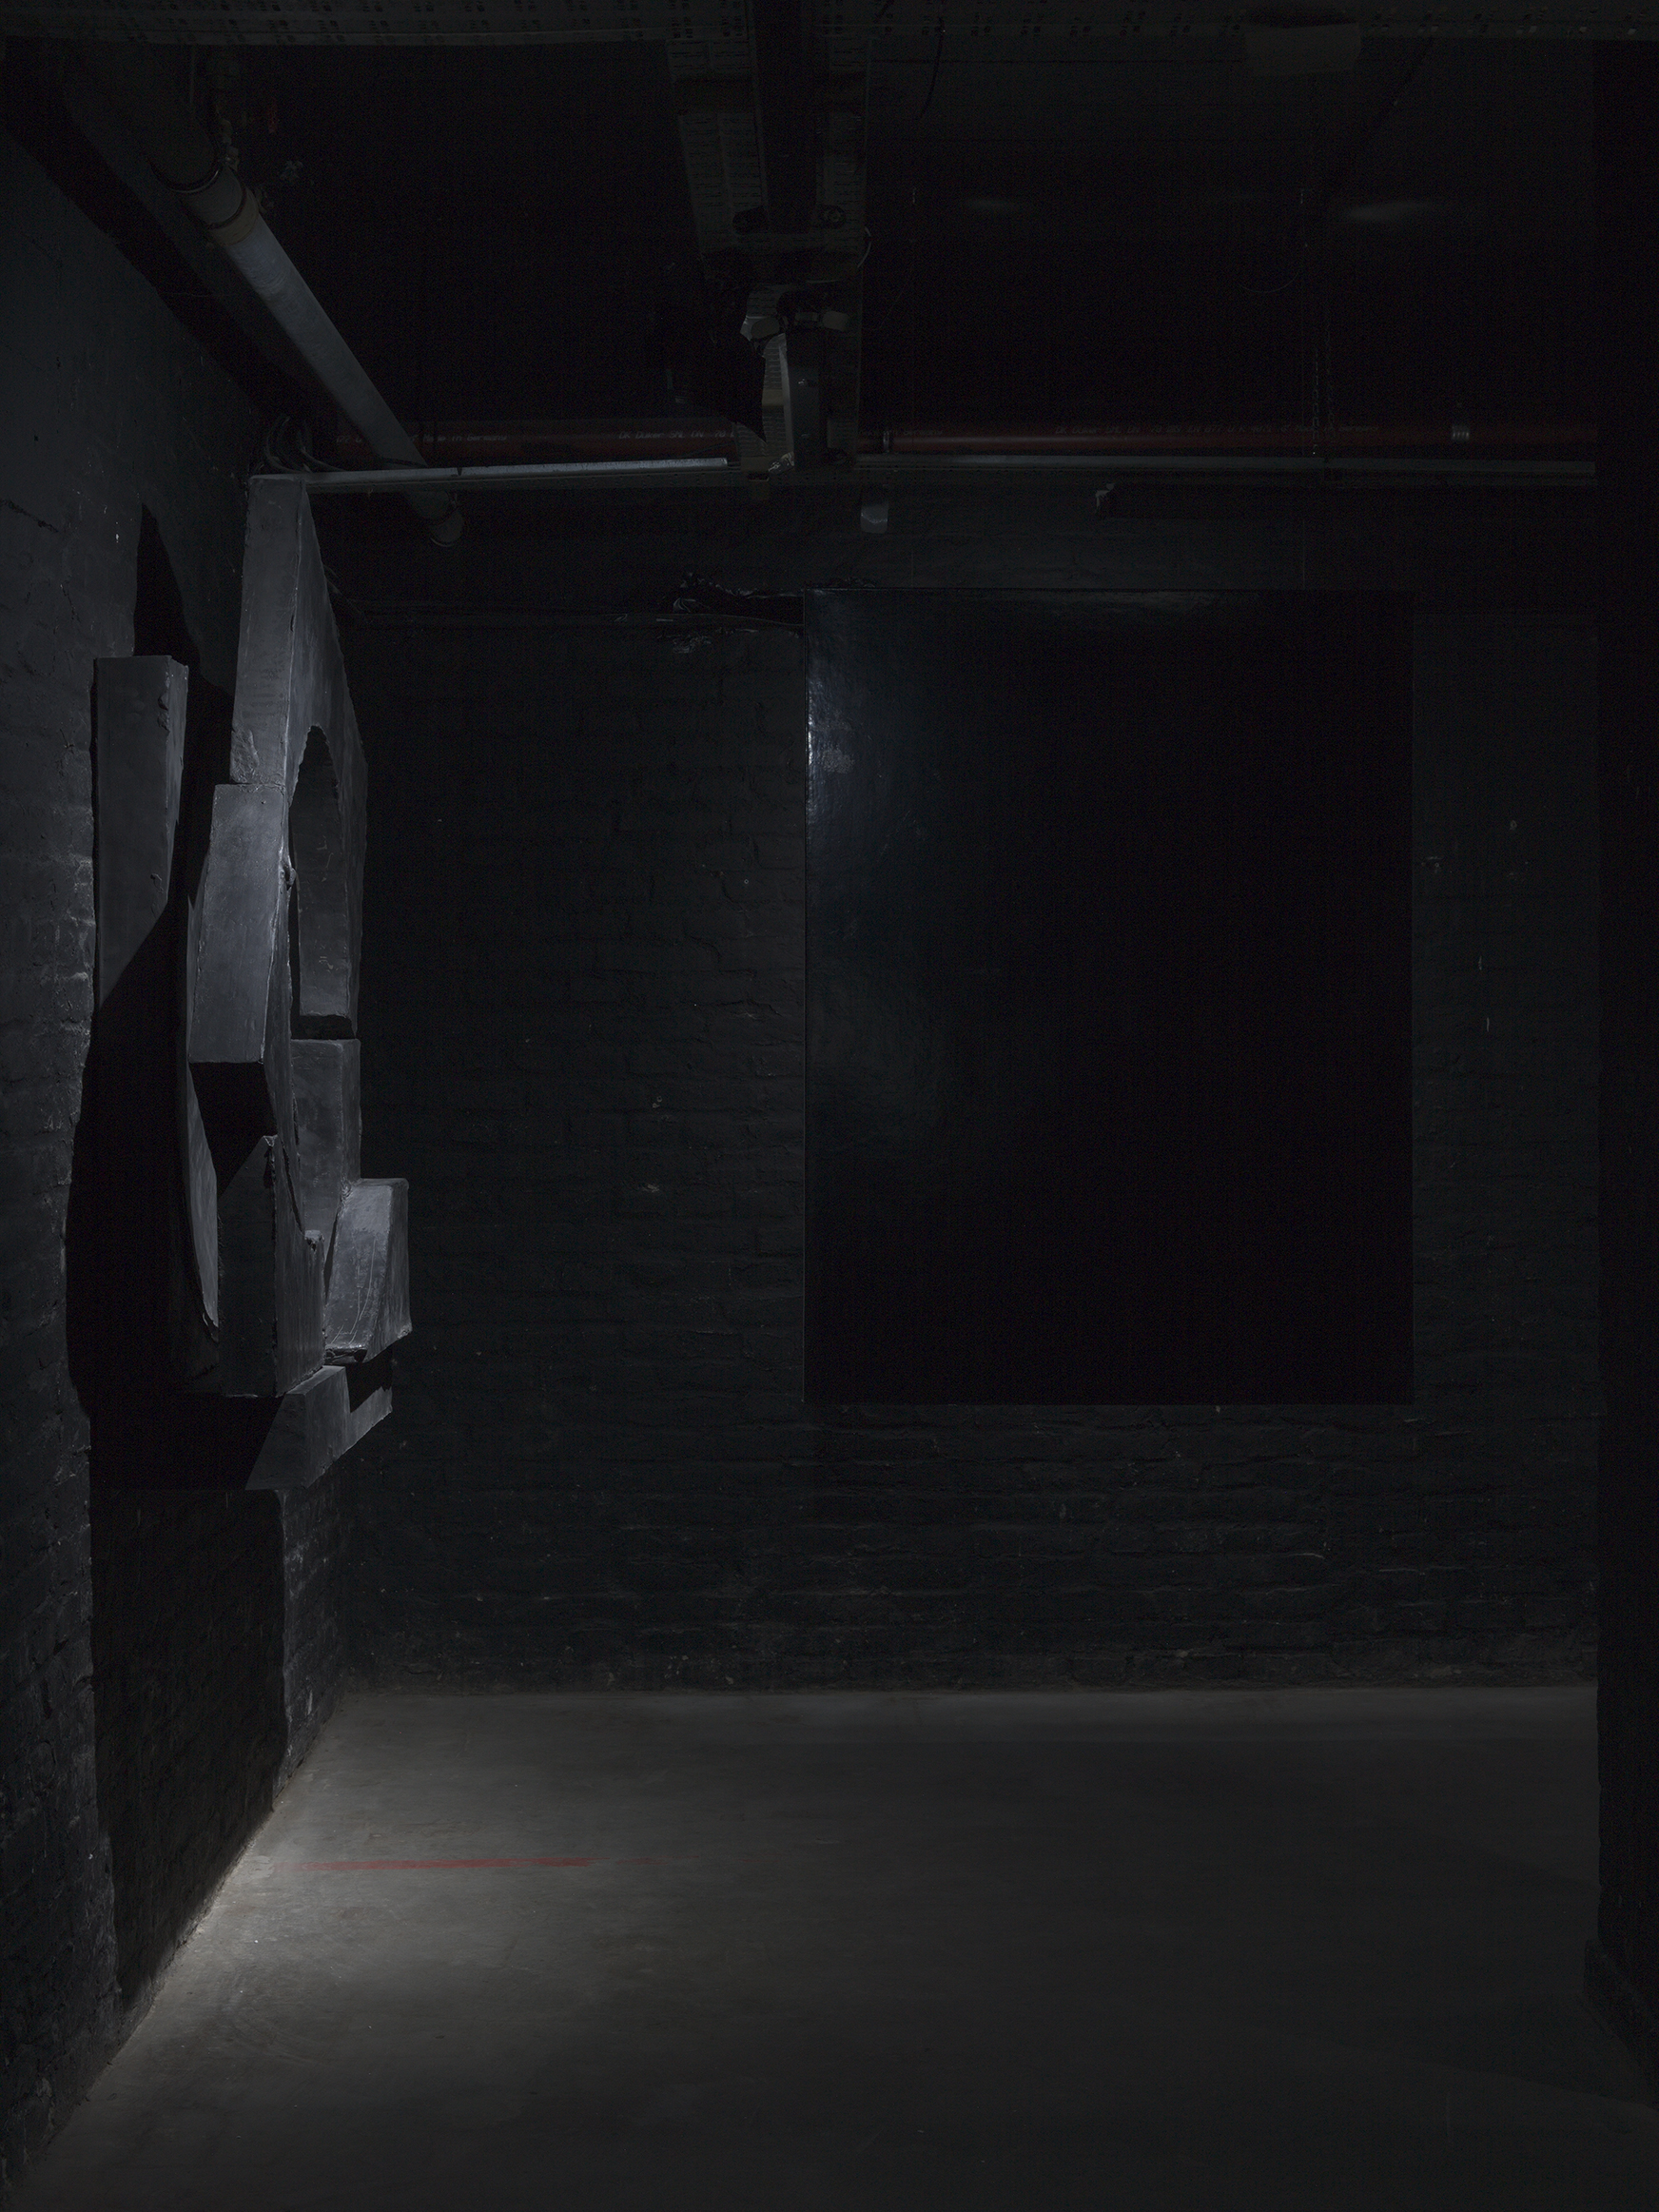 Installation Views - Ecstasies Teresa, 2018 - Group exhibition, Alte Münze, Berlin - black sculptures and painting by Erik Andersen